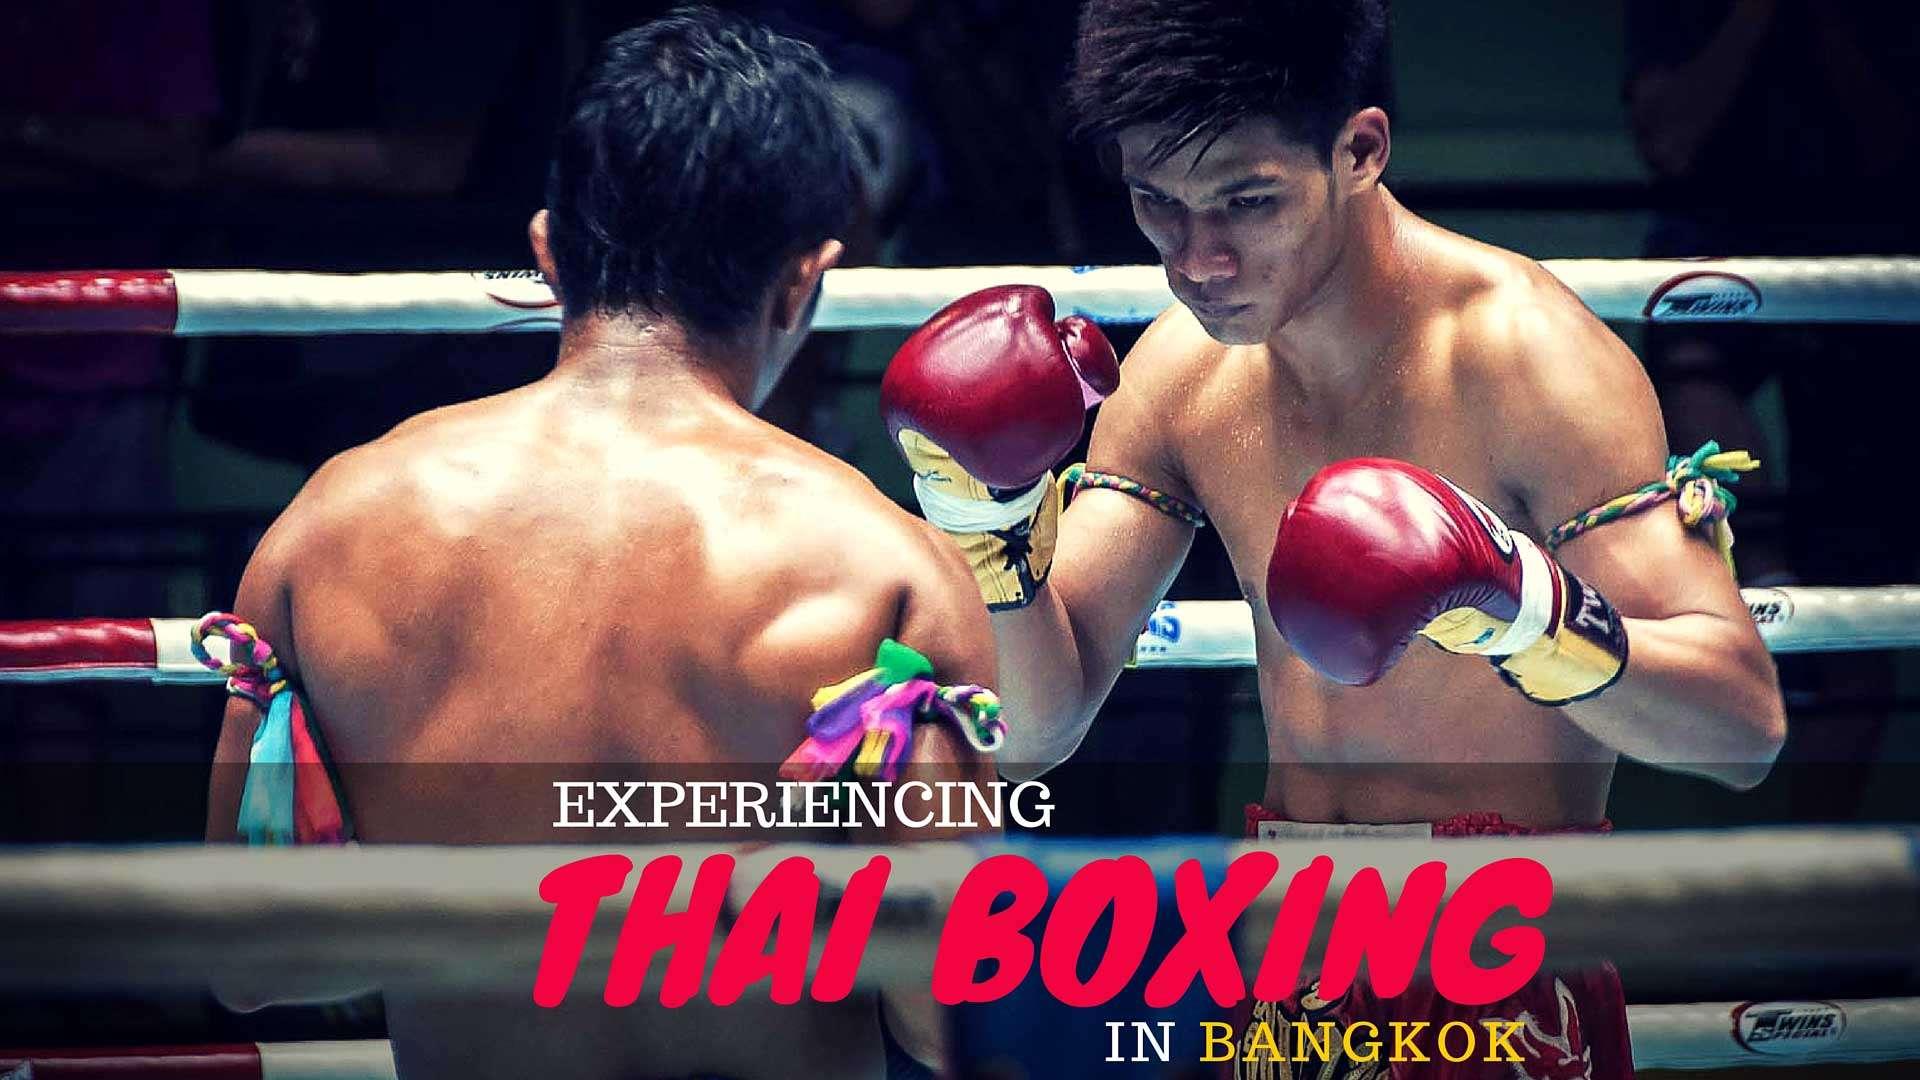 Experiencing Thai Boxing in Bangkok